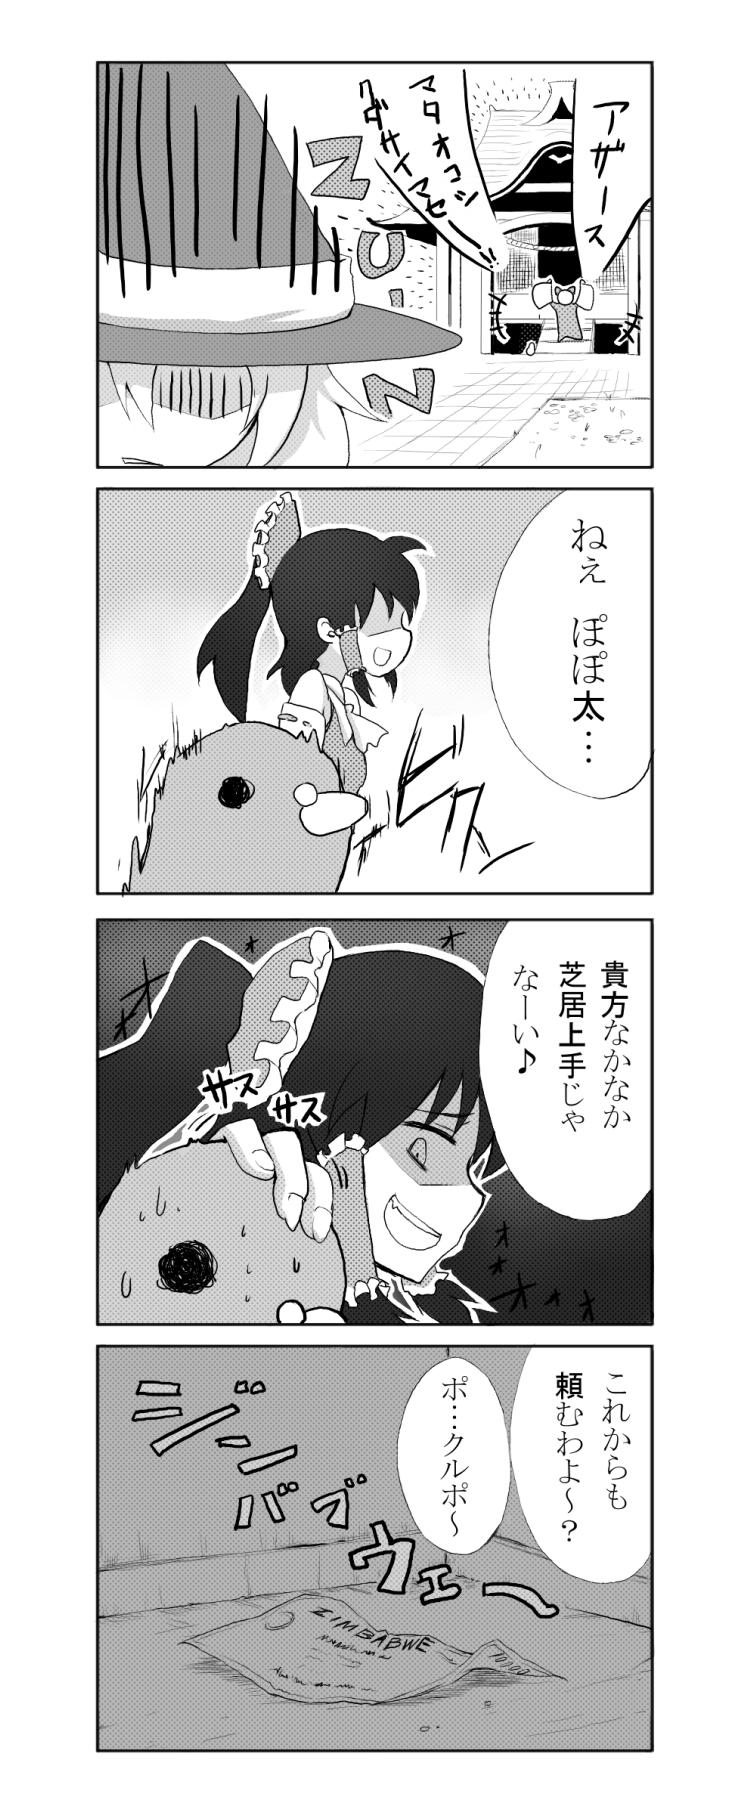 hakurei reimu and kirisame marisa (touhou) drawn by morino hon